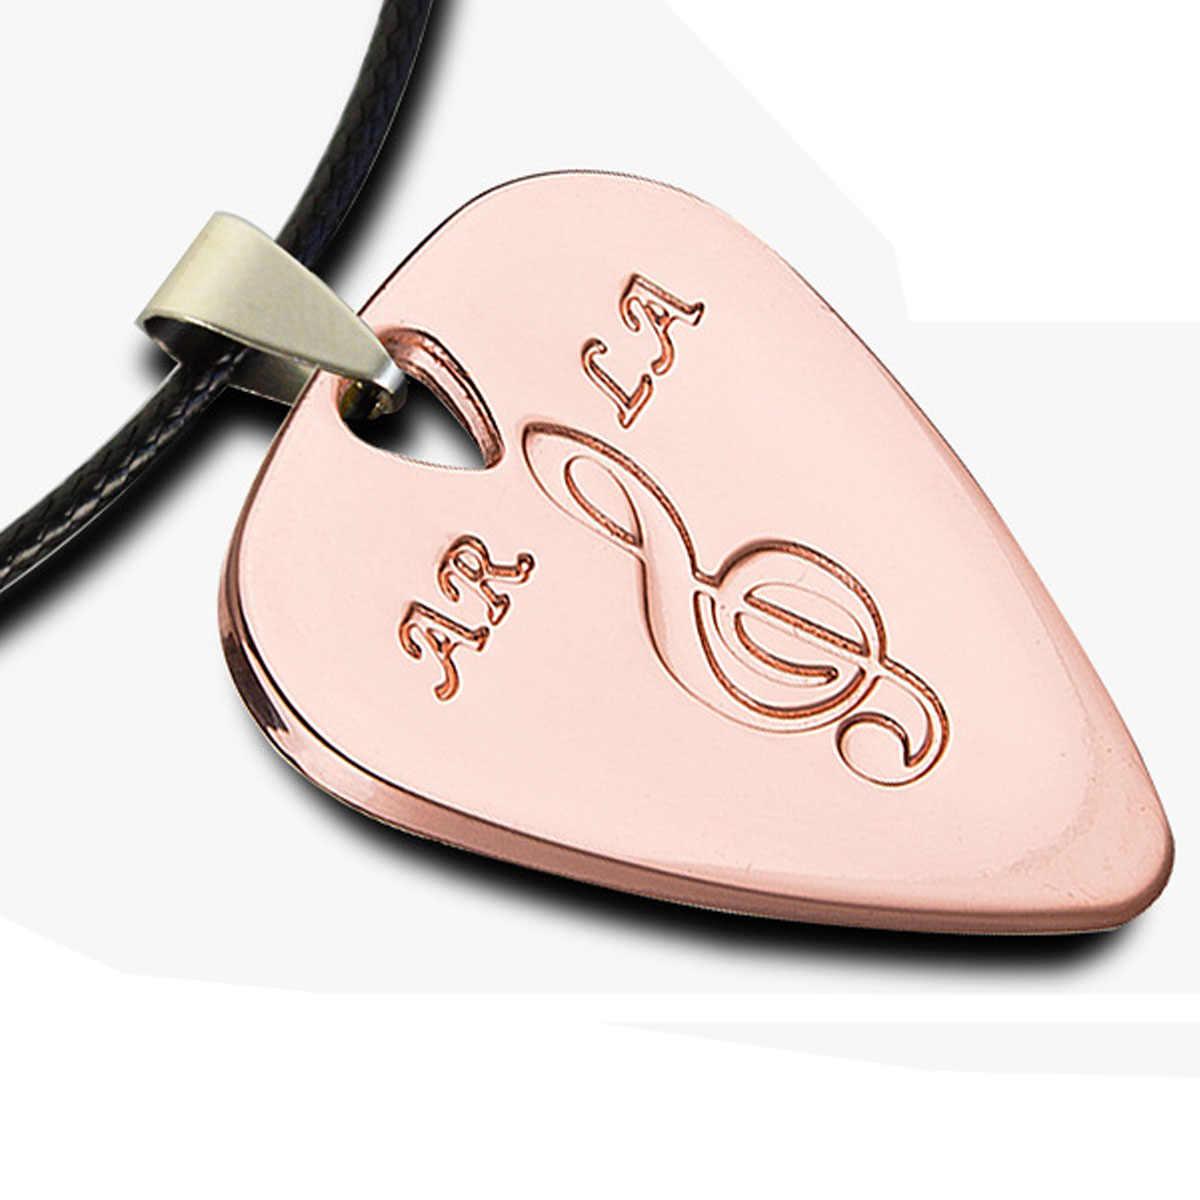 HOT-1Pcs מתכת גיטרה פיק 0.38mm דק עמיד כסף צבע מקצועי בס Ukelele גיטרה מבחר